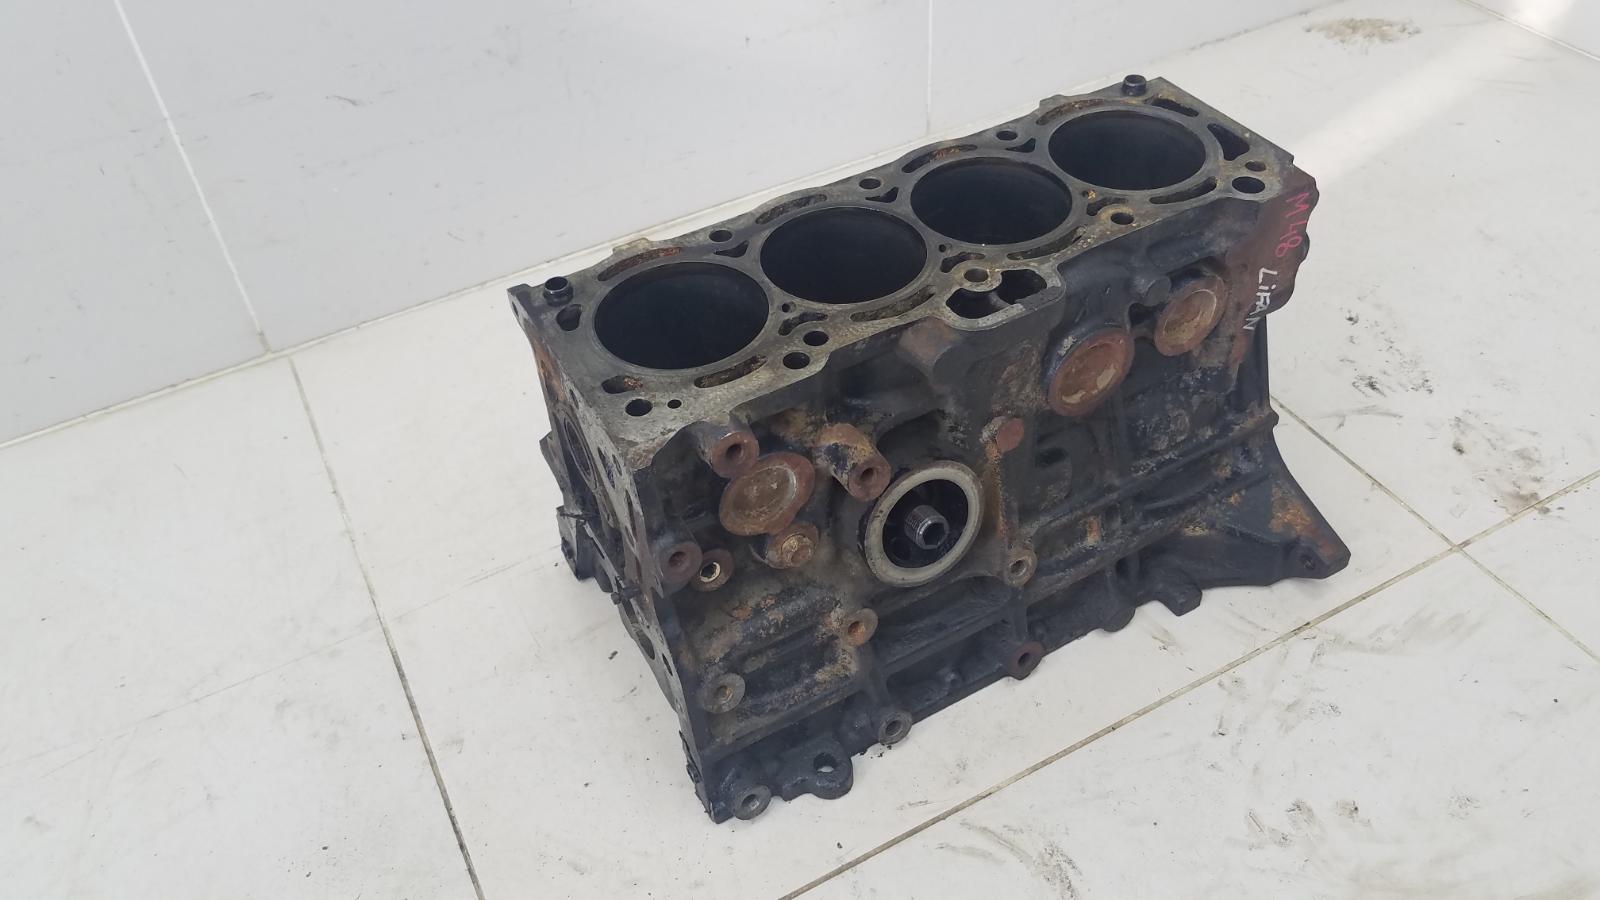 Блок двигателя двс Lifan Solano 620 LF481Q3 2011